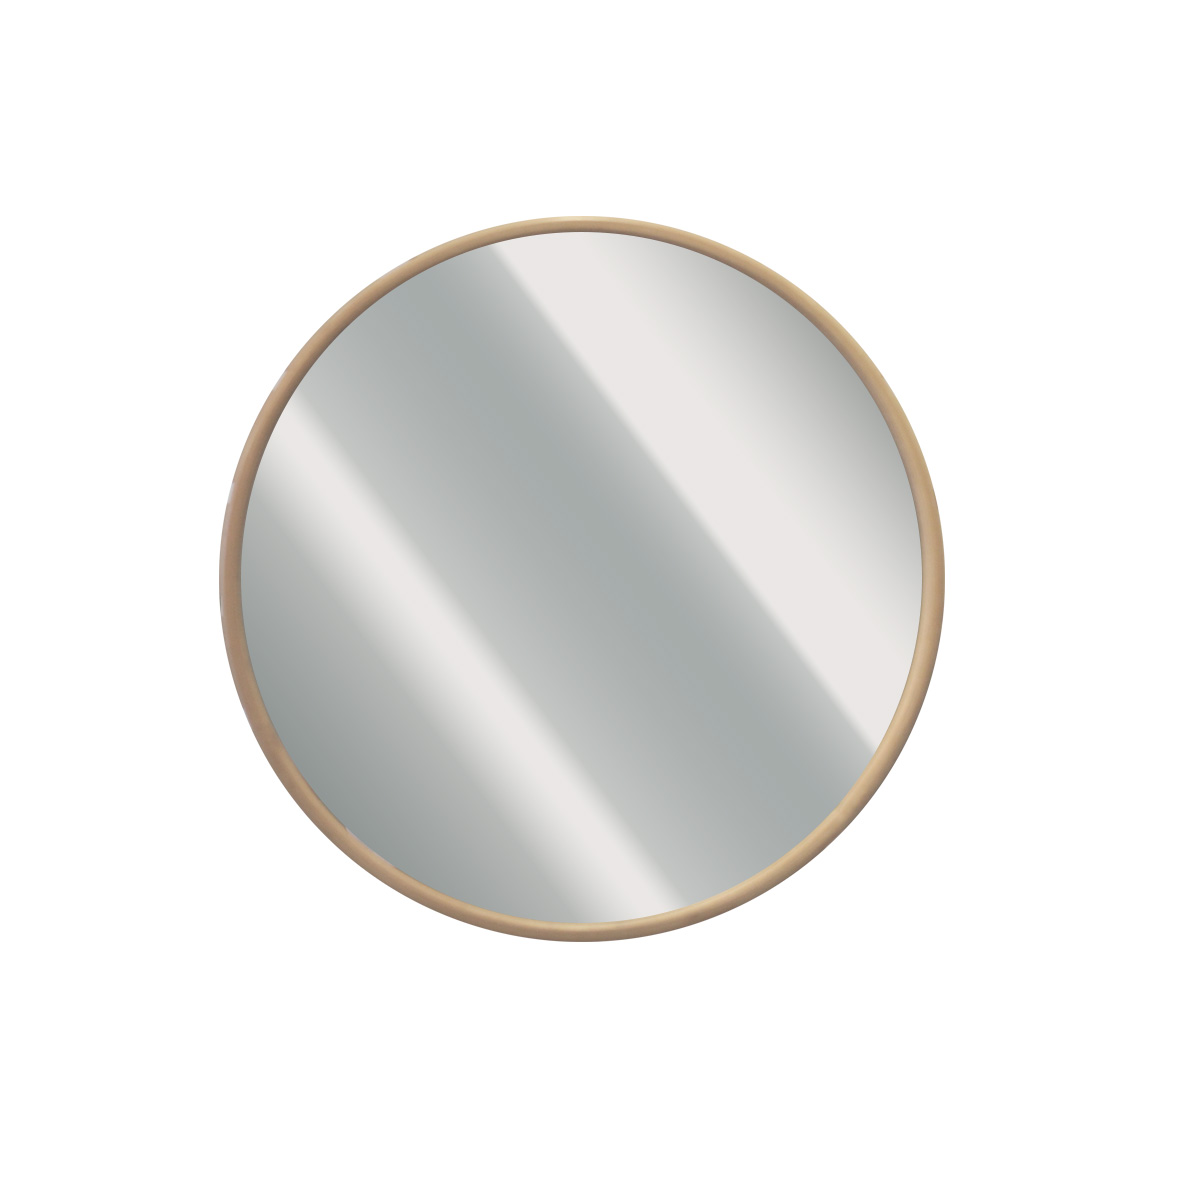 Ogledalo MUS-200